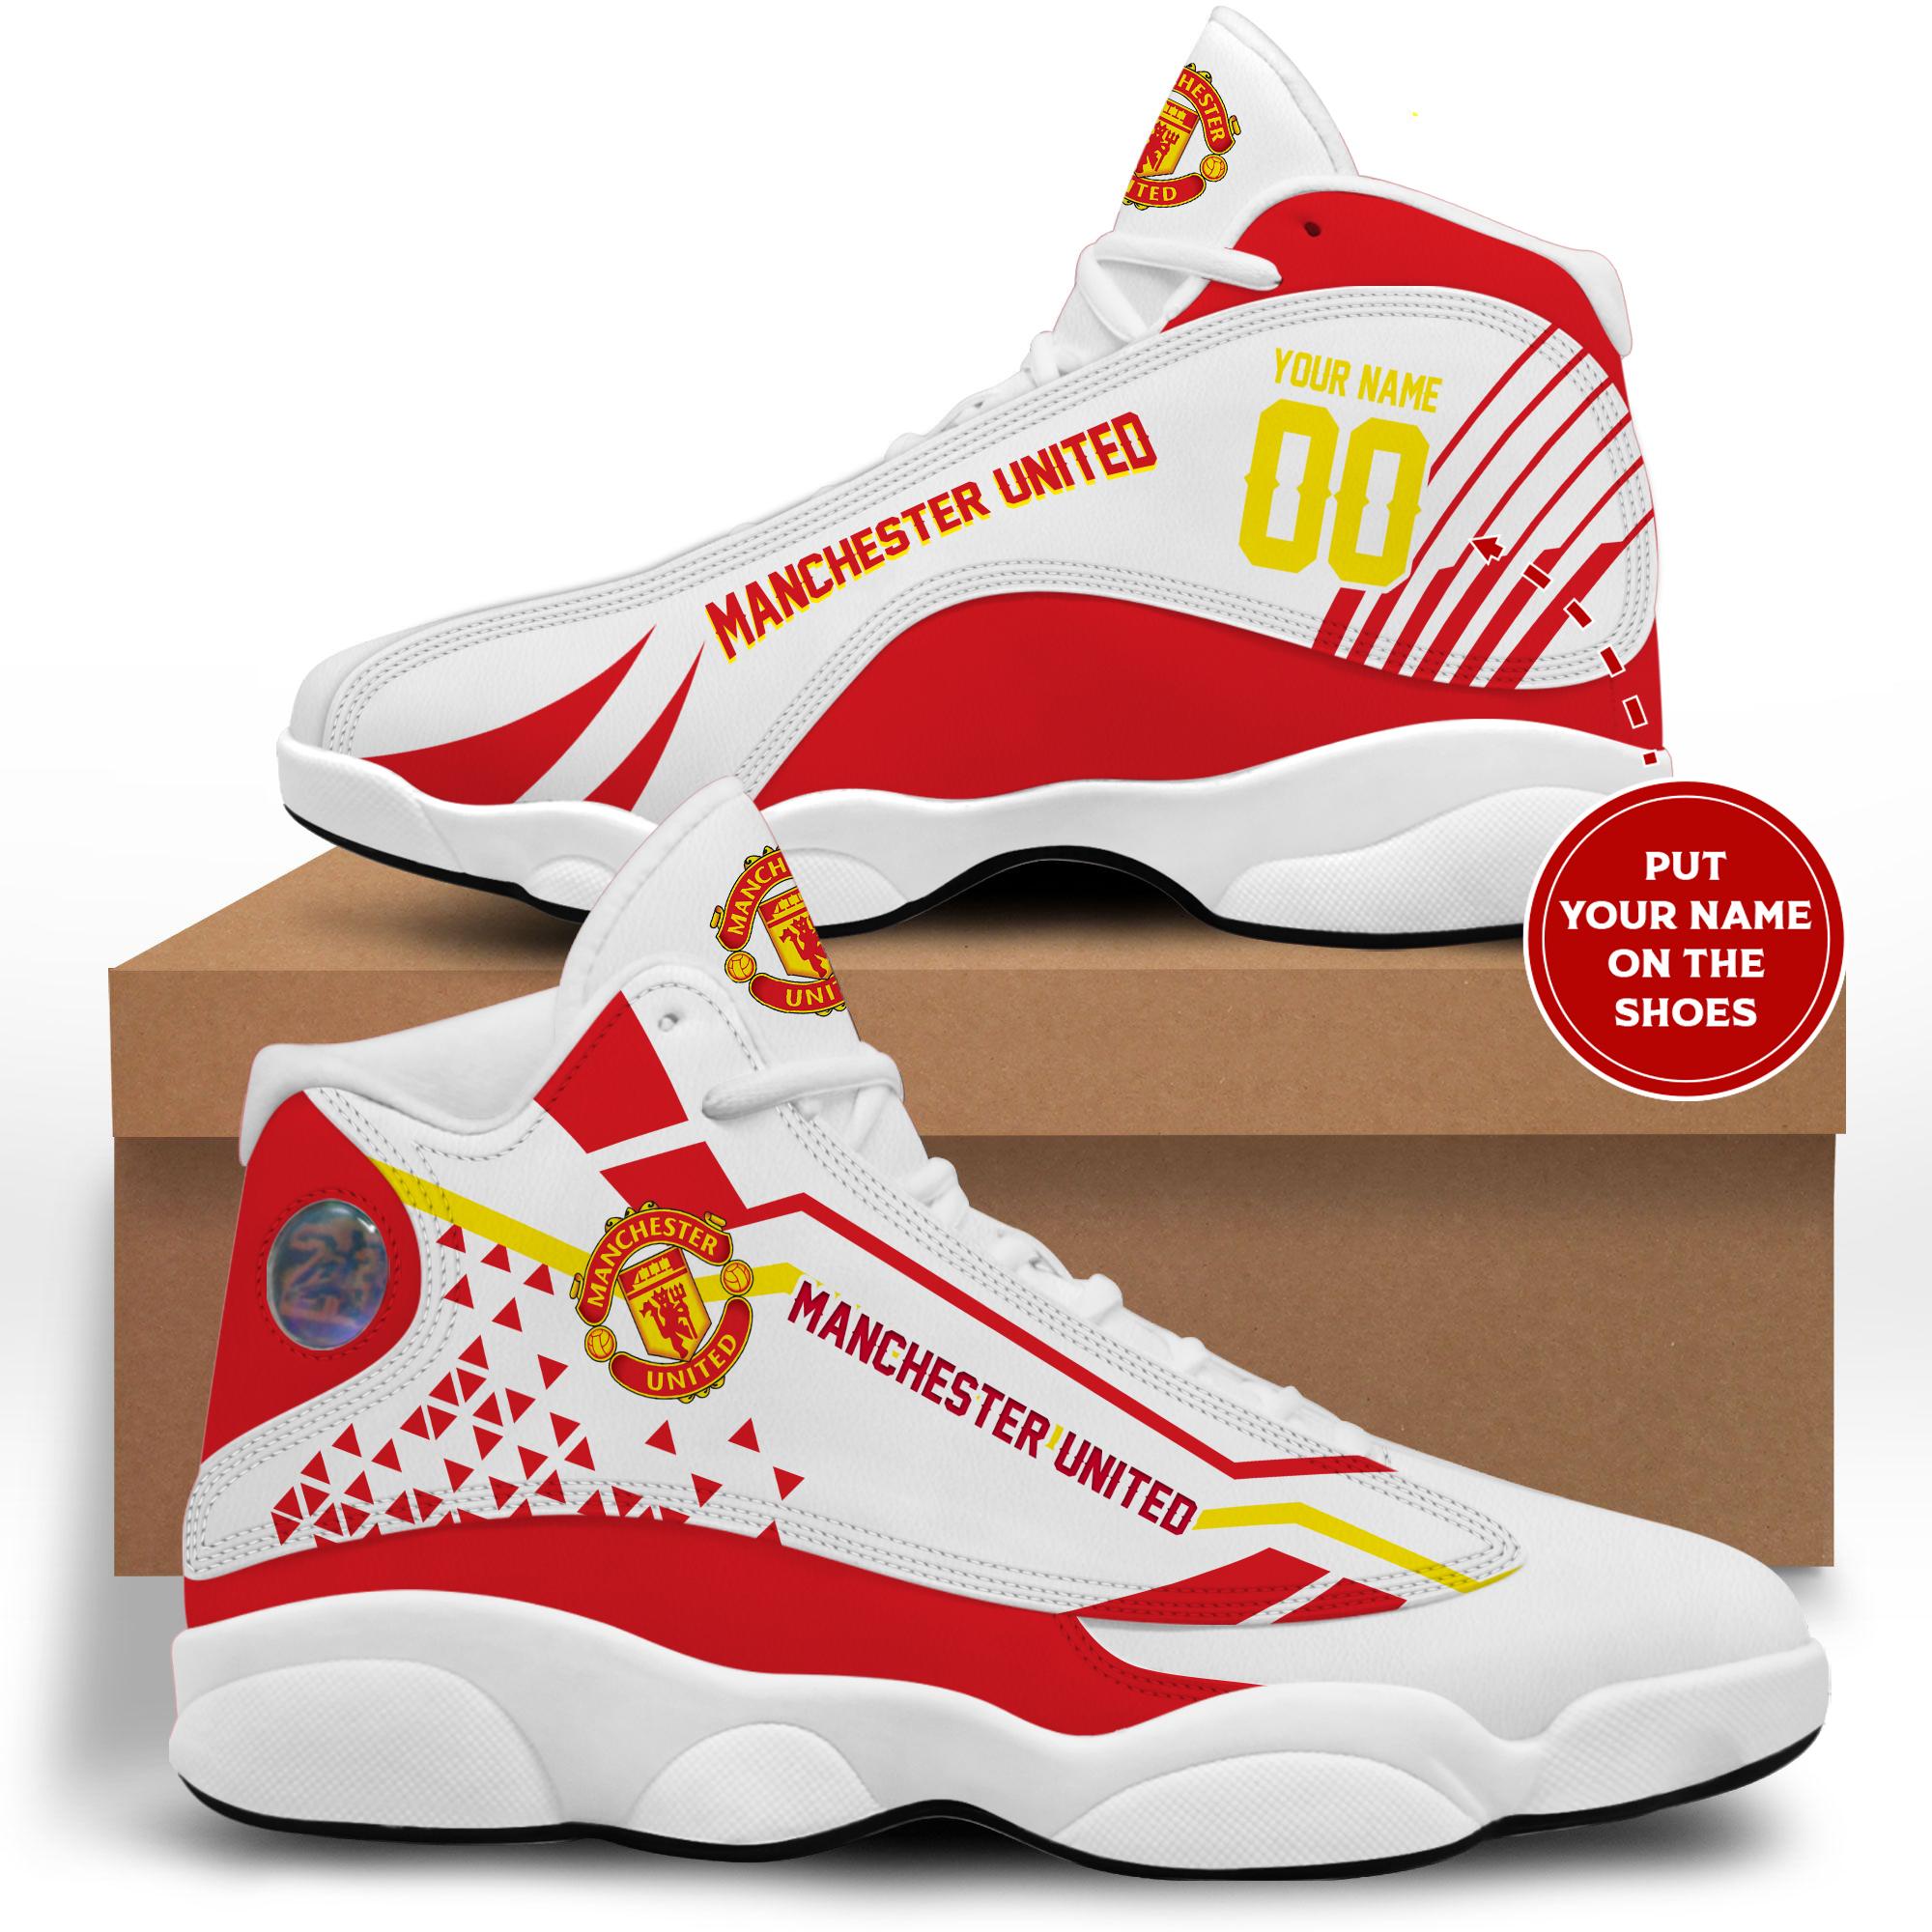 Manchester United custom name air jordan 13 shoes